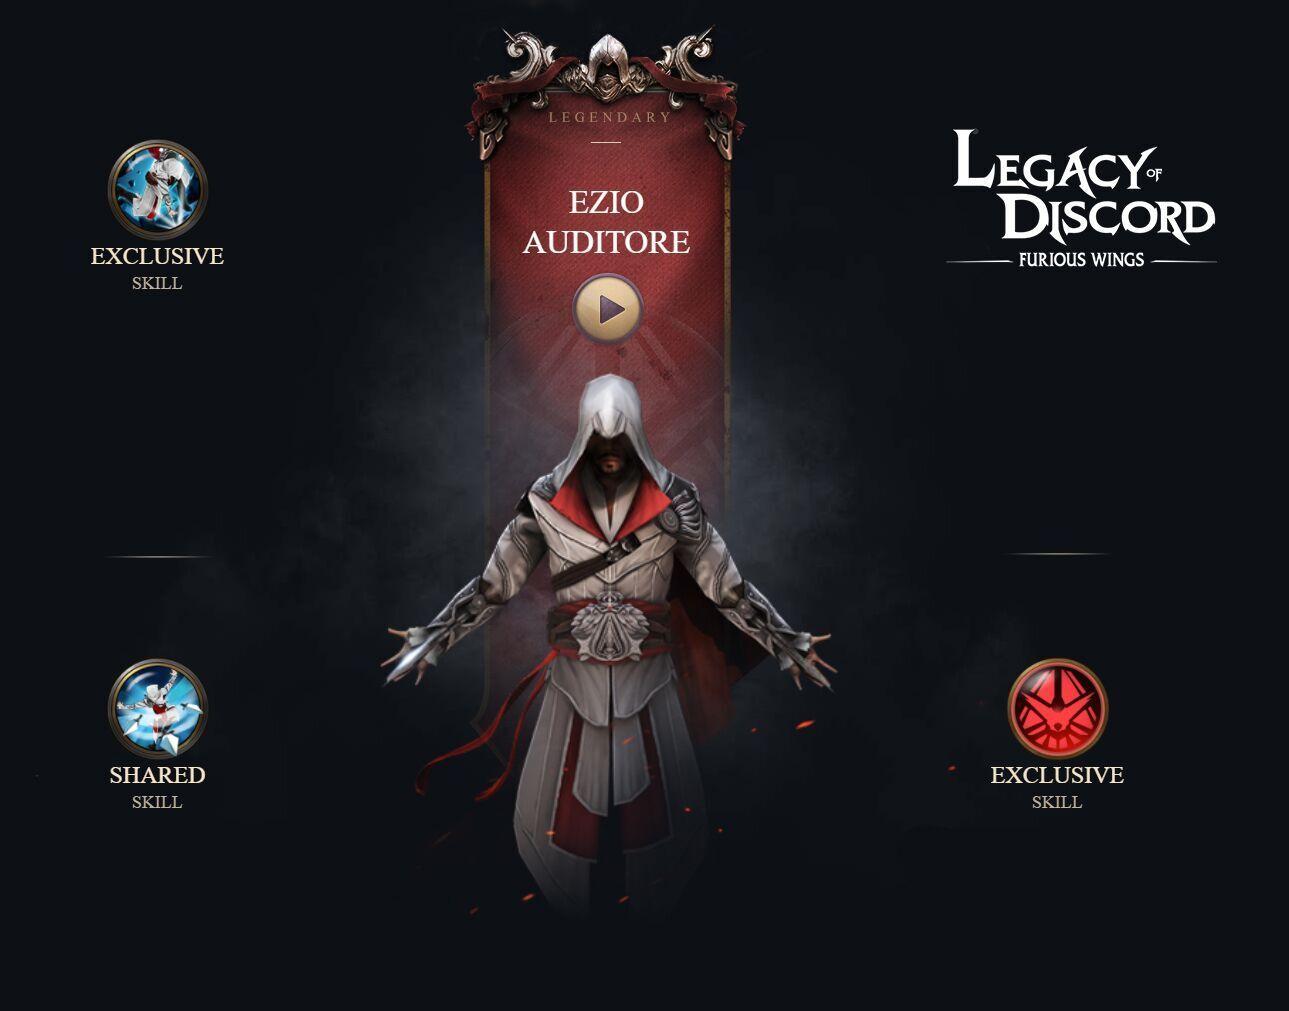 Assassin's Creed karakterleri mobil oyun Legacy of Discord'da